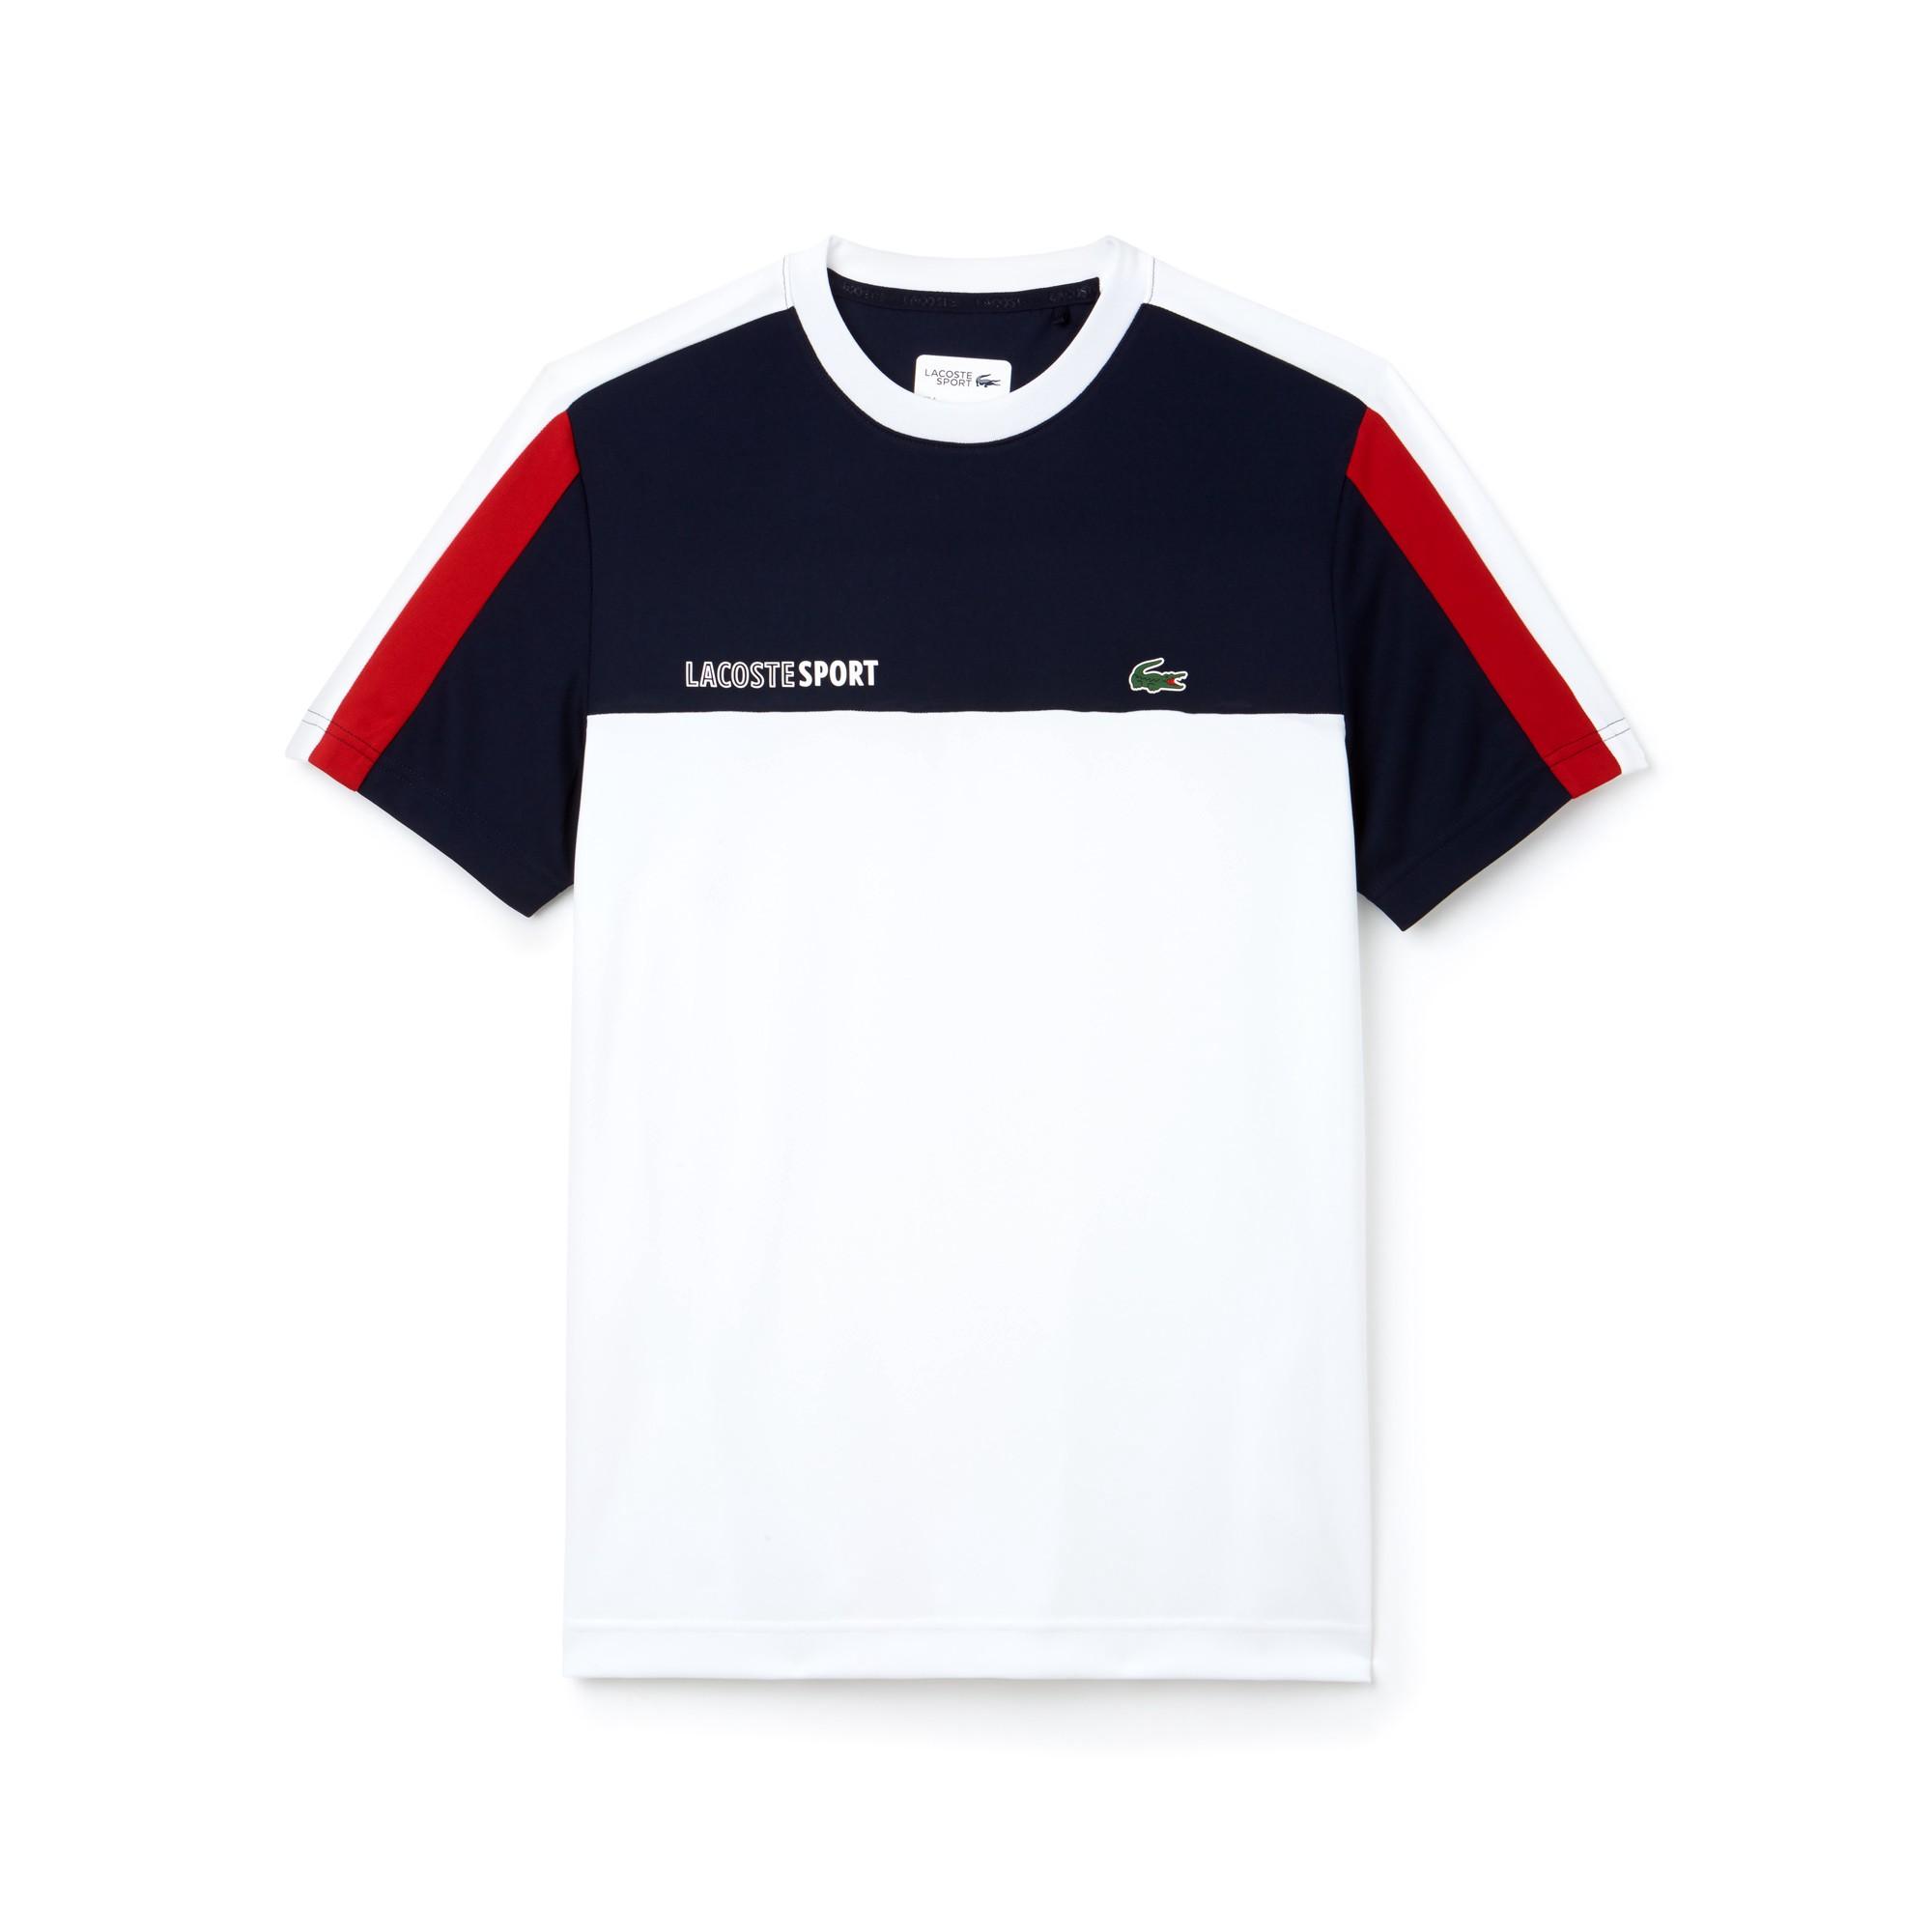 Lacoste Men S Sport Crew Neck Colorblock Pique Tennis T Shirt Navy Blue White Lighthous Xxl Green Camisetas Masculinas Camisas Masculinas Tshirt Masculino